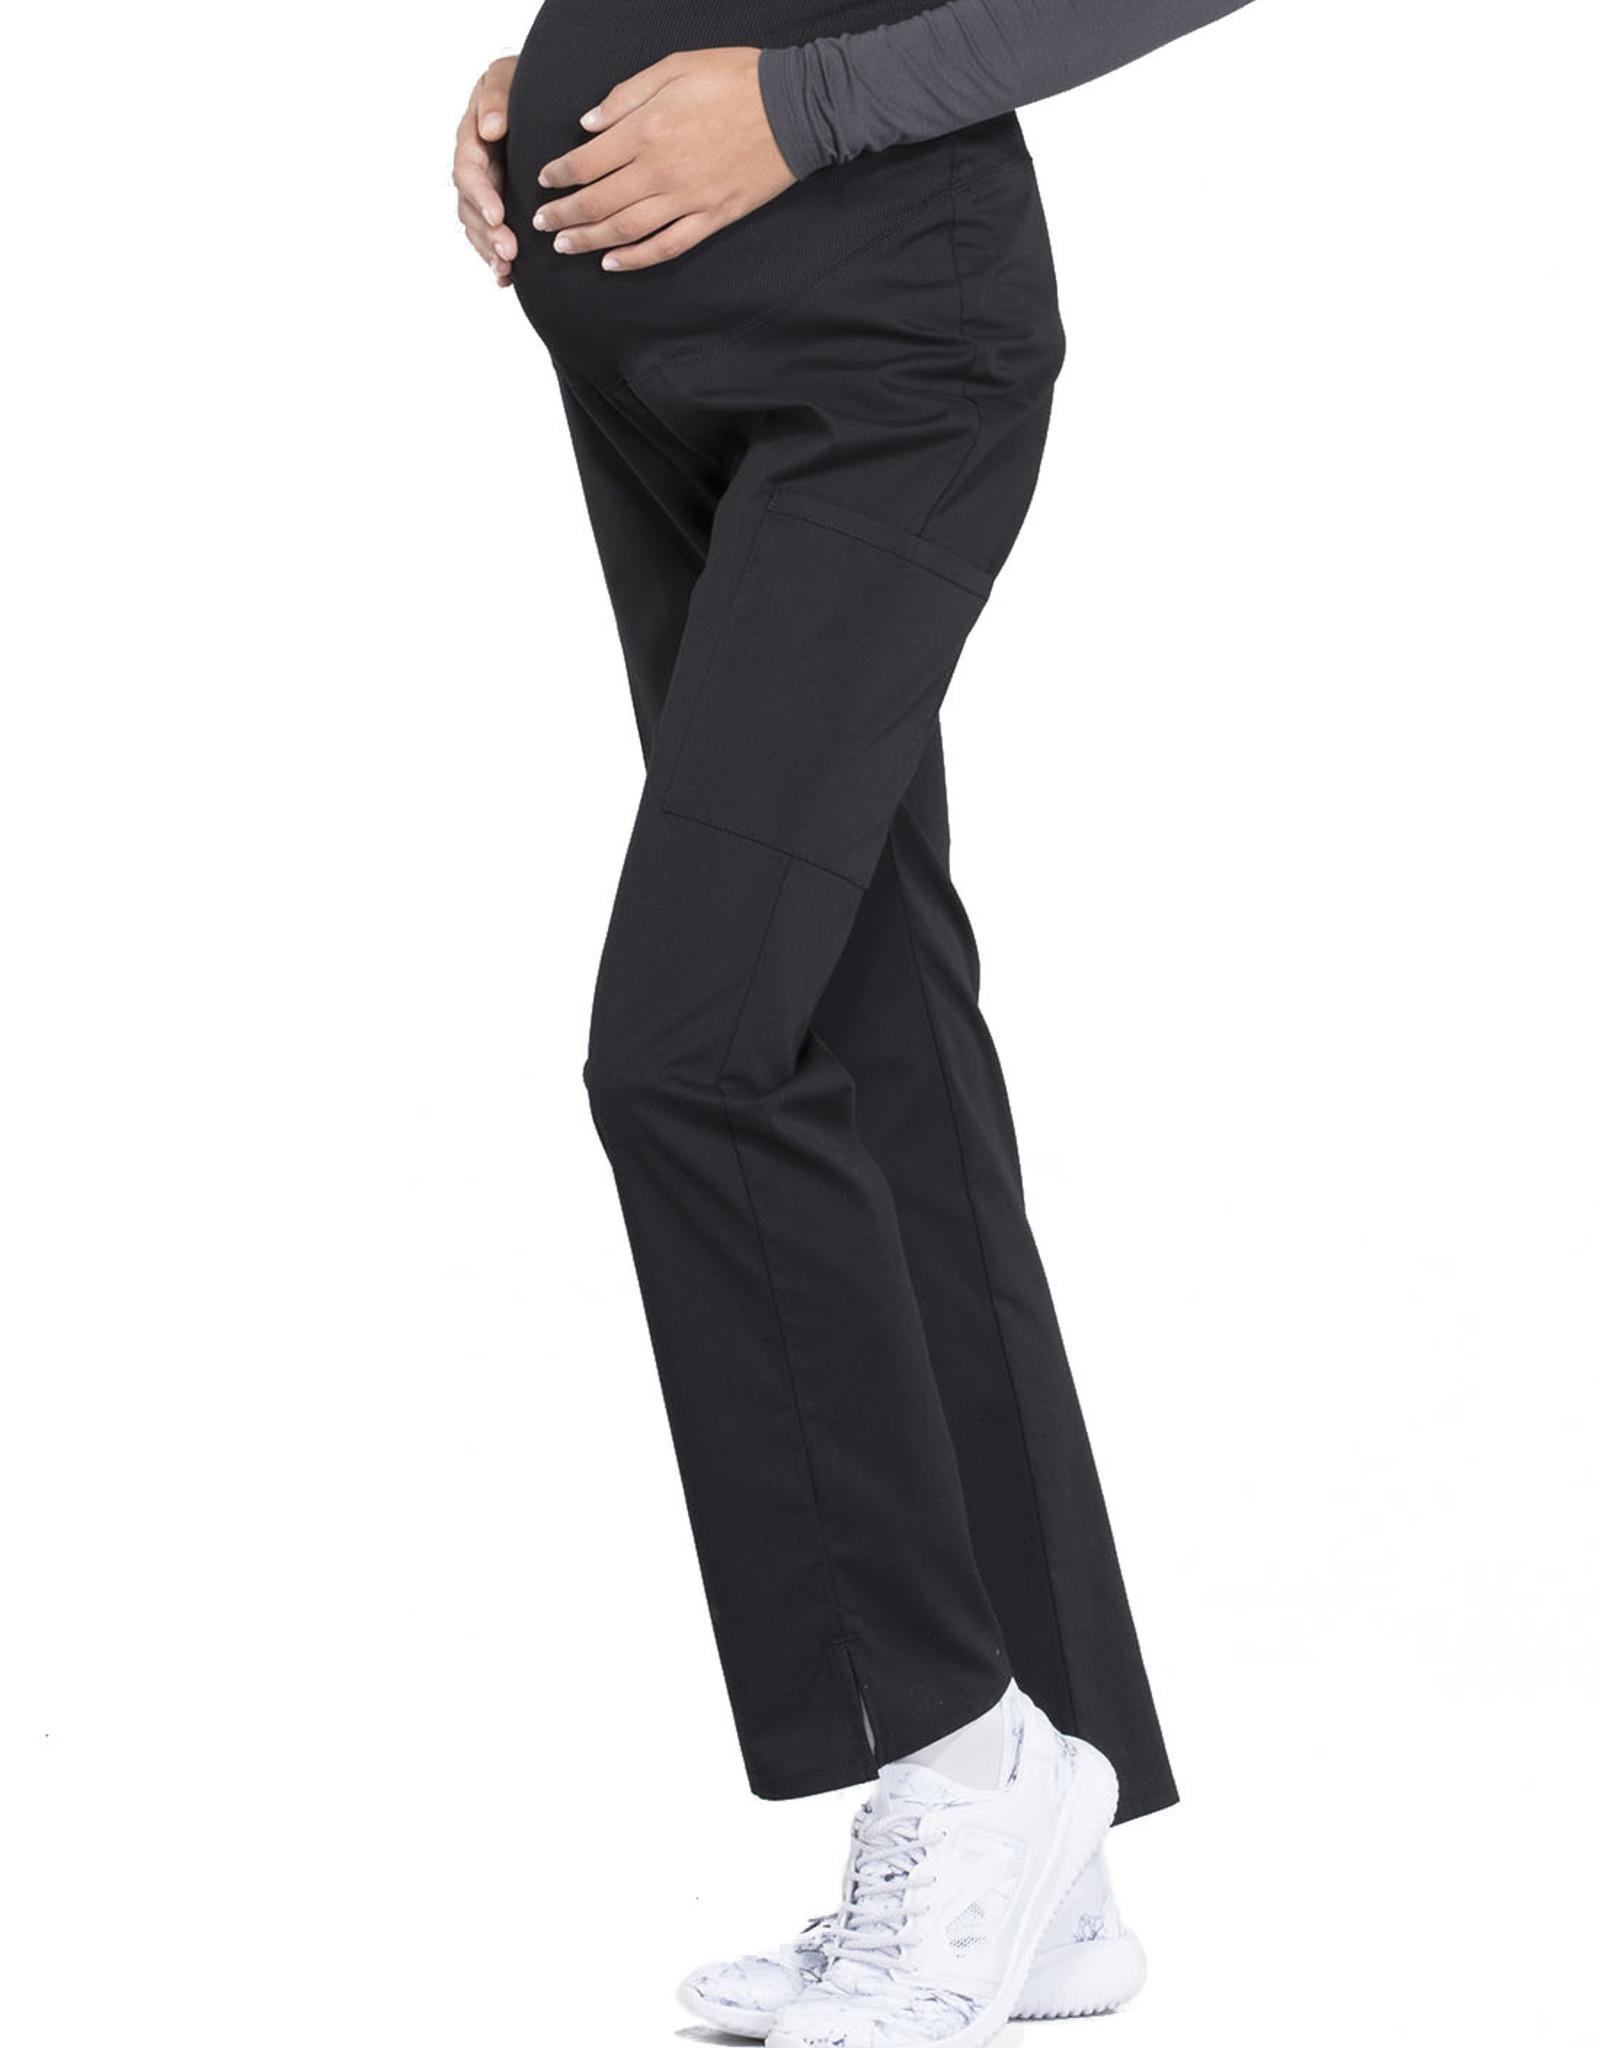 Maternity Straight Leg Pant - Maternity Pant WW220